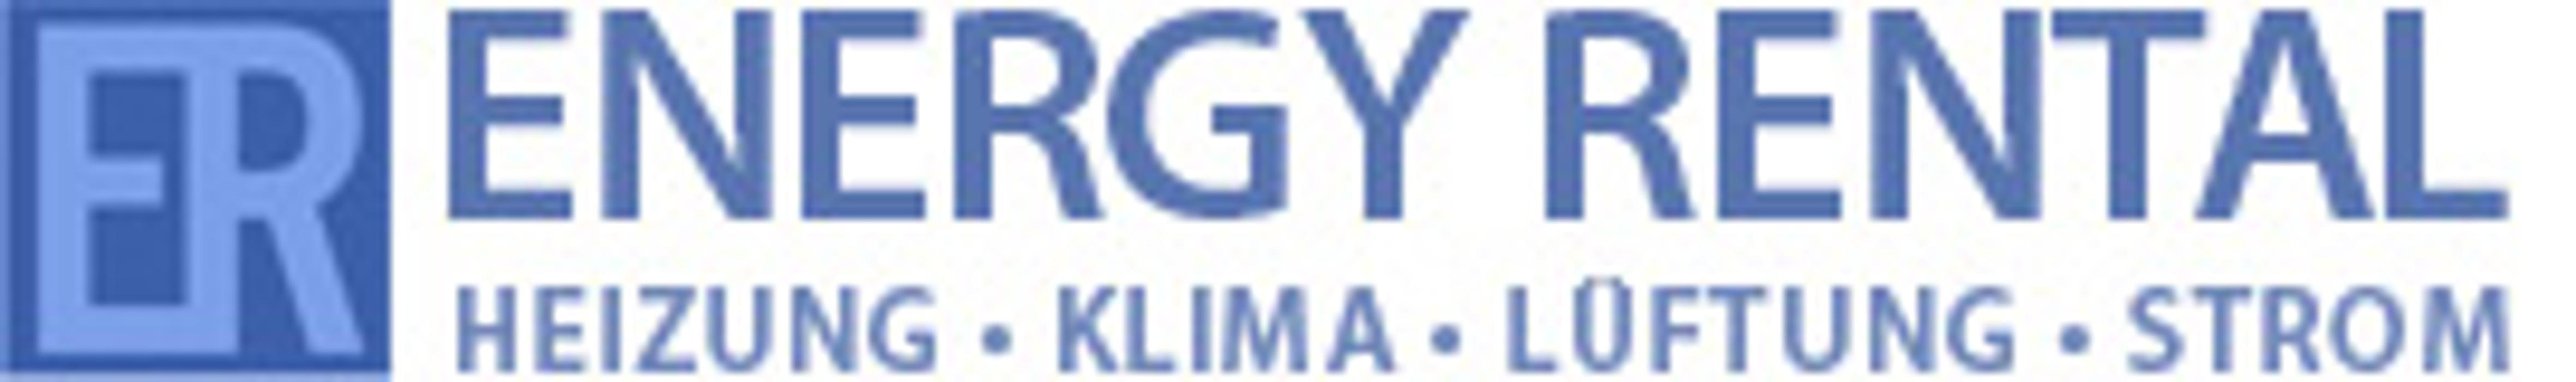 ER Energy Rental